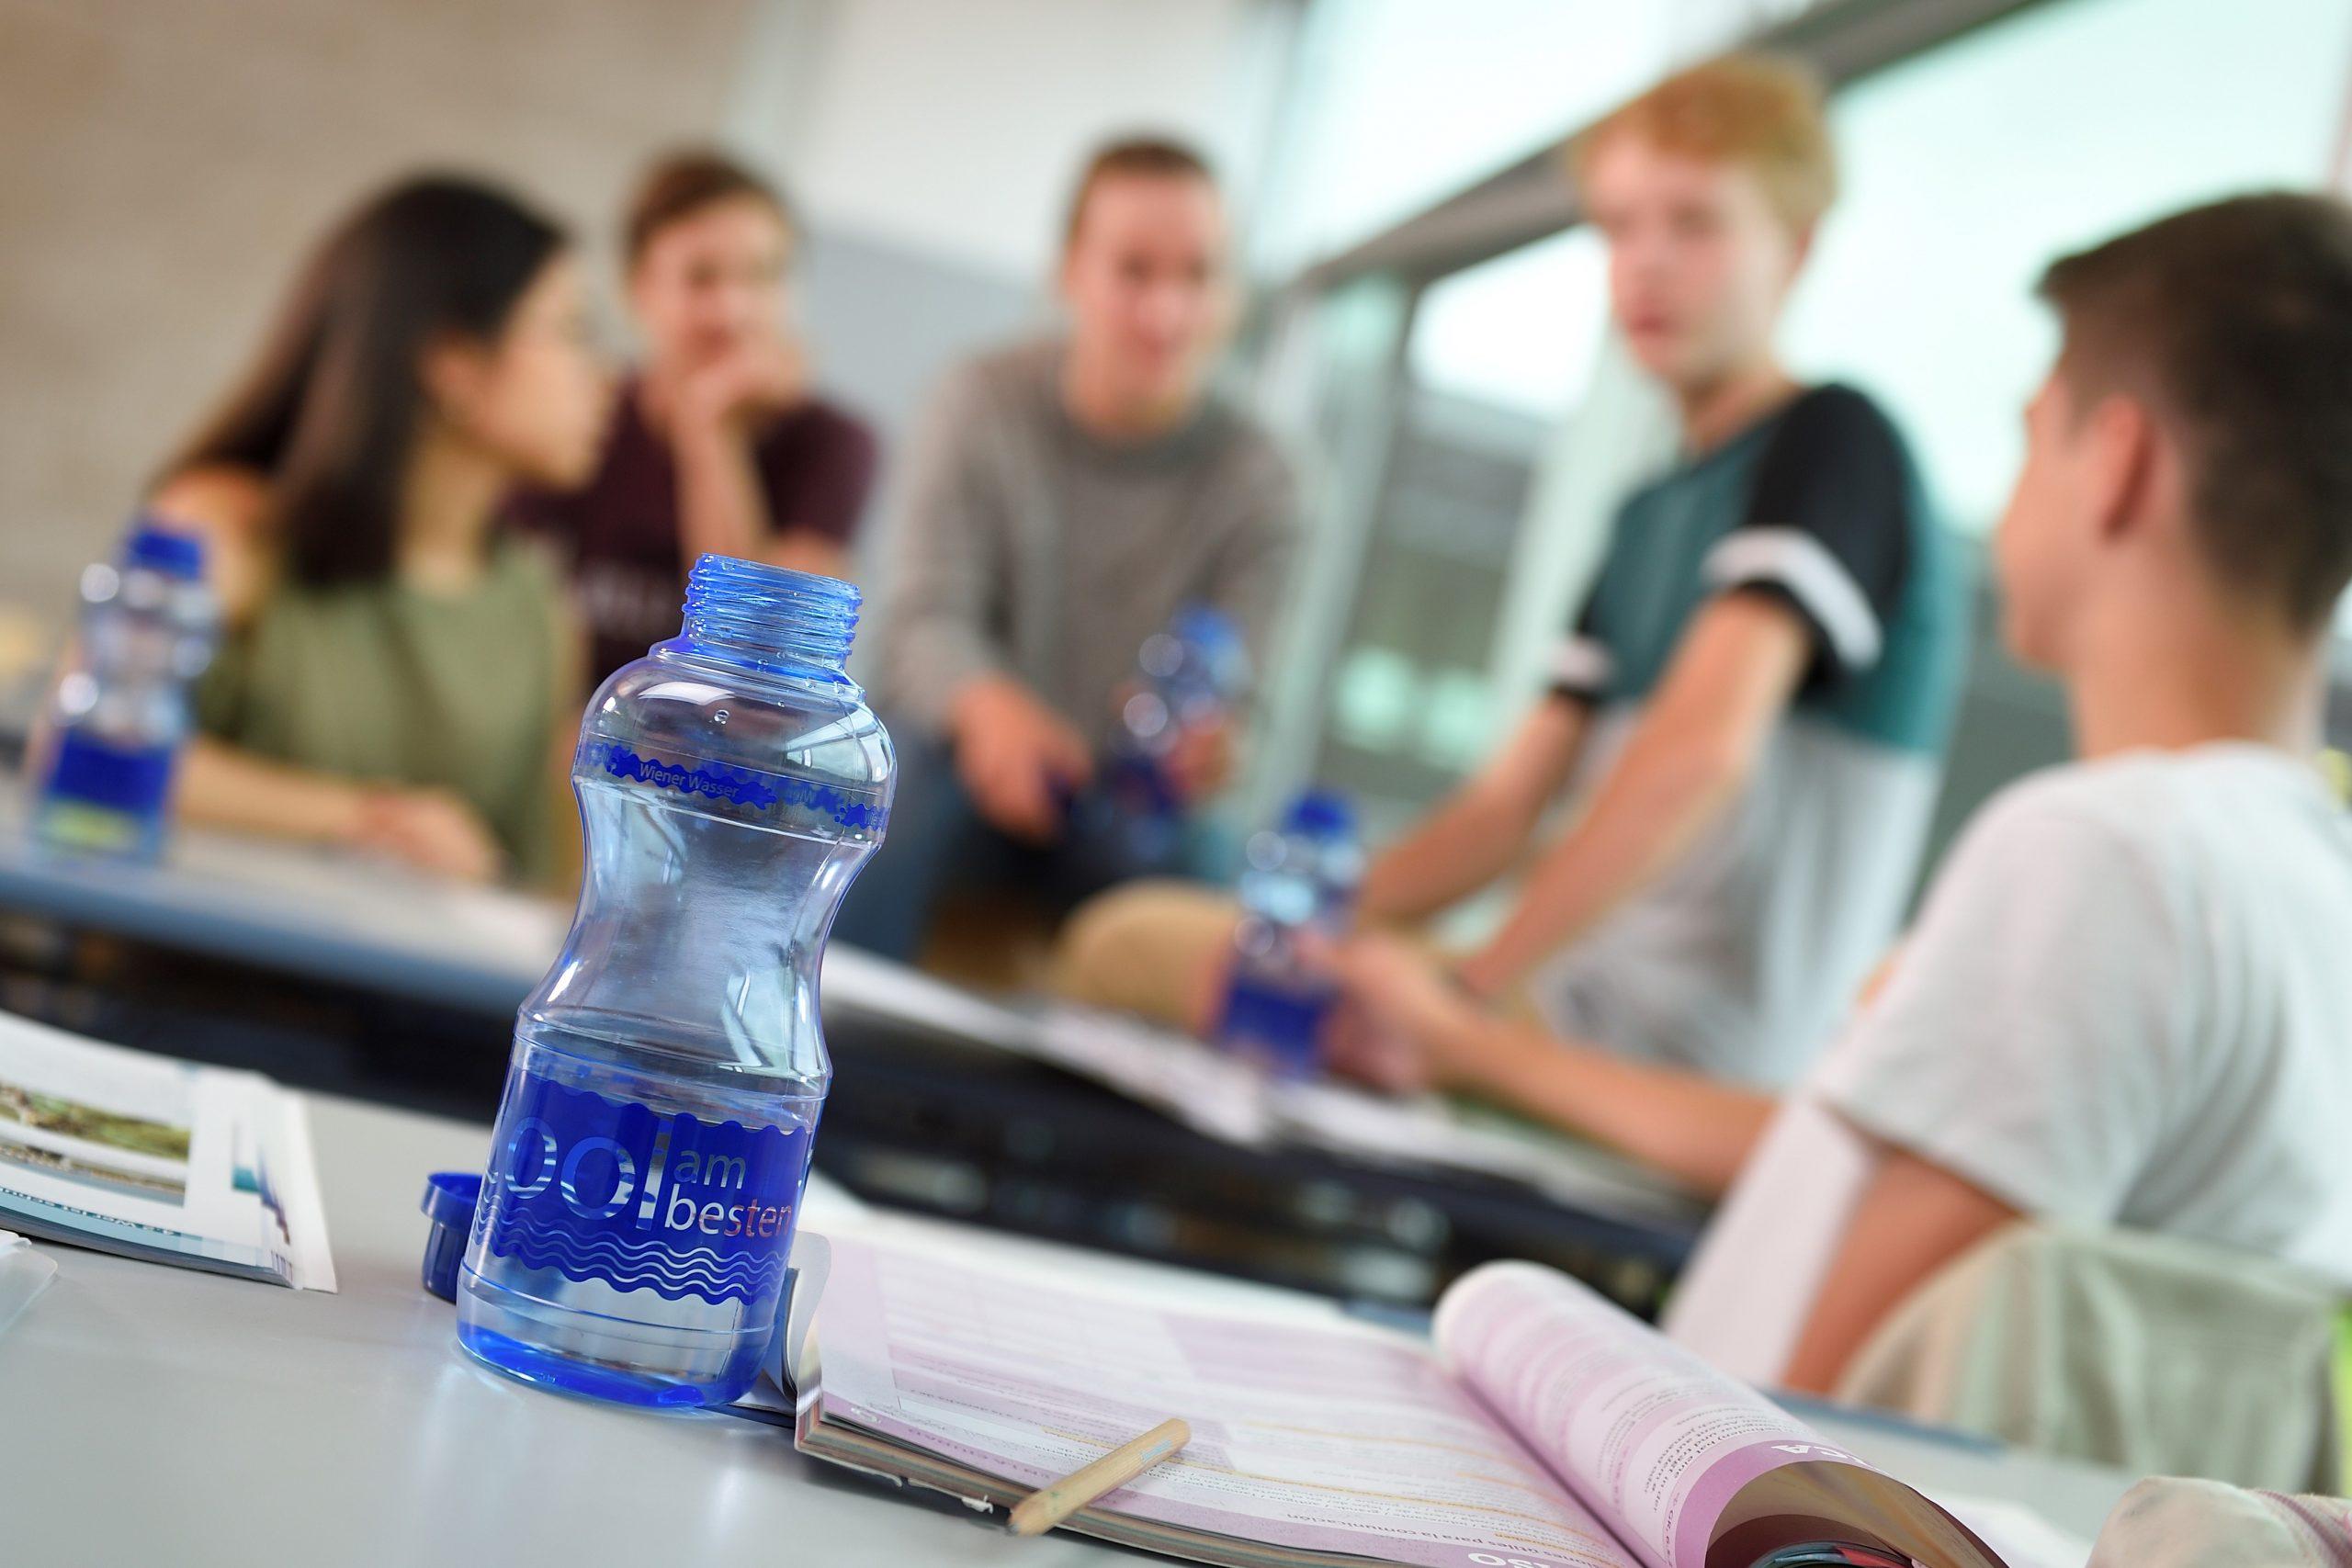 Wasserschule_Wiener Wasser/Zinner